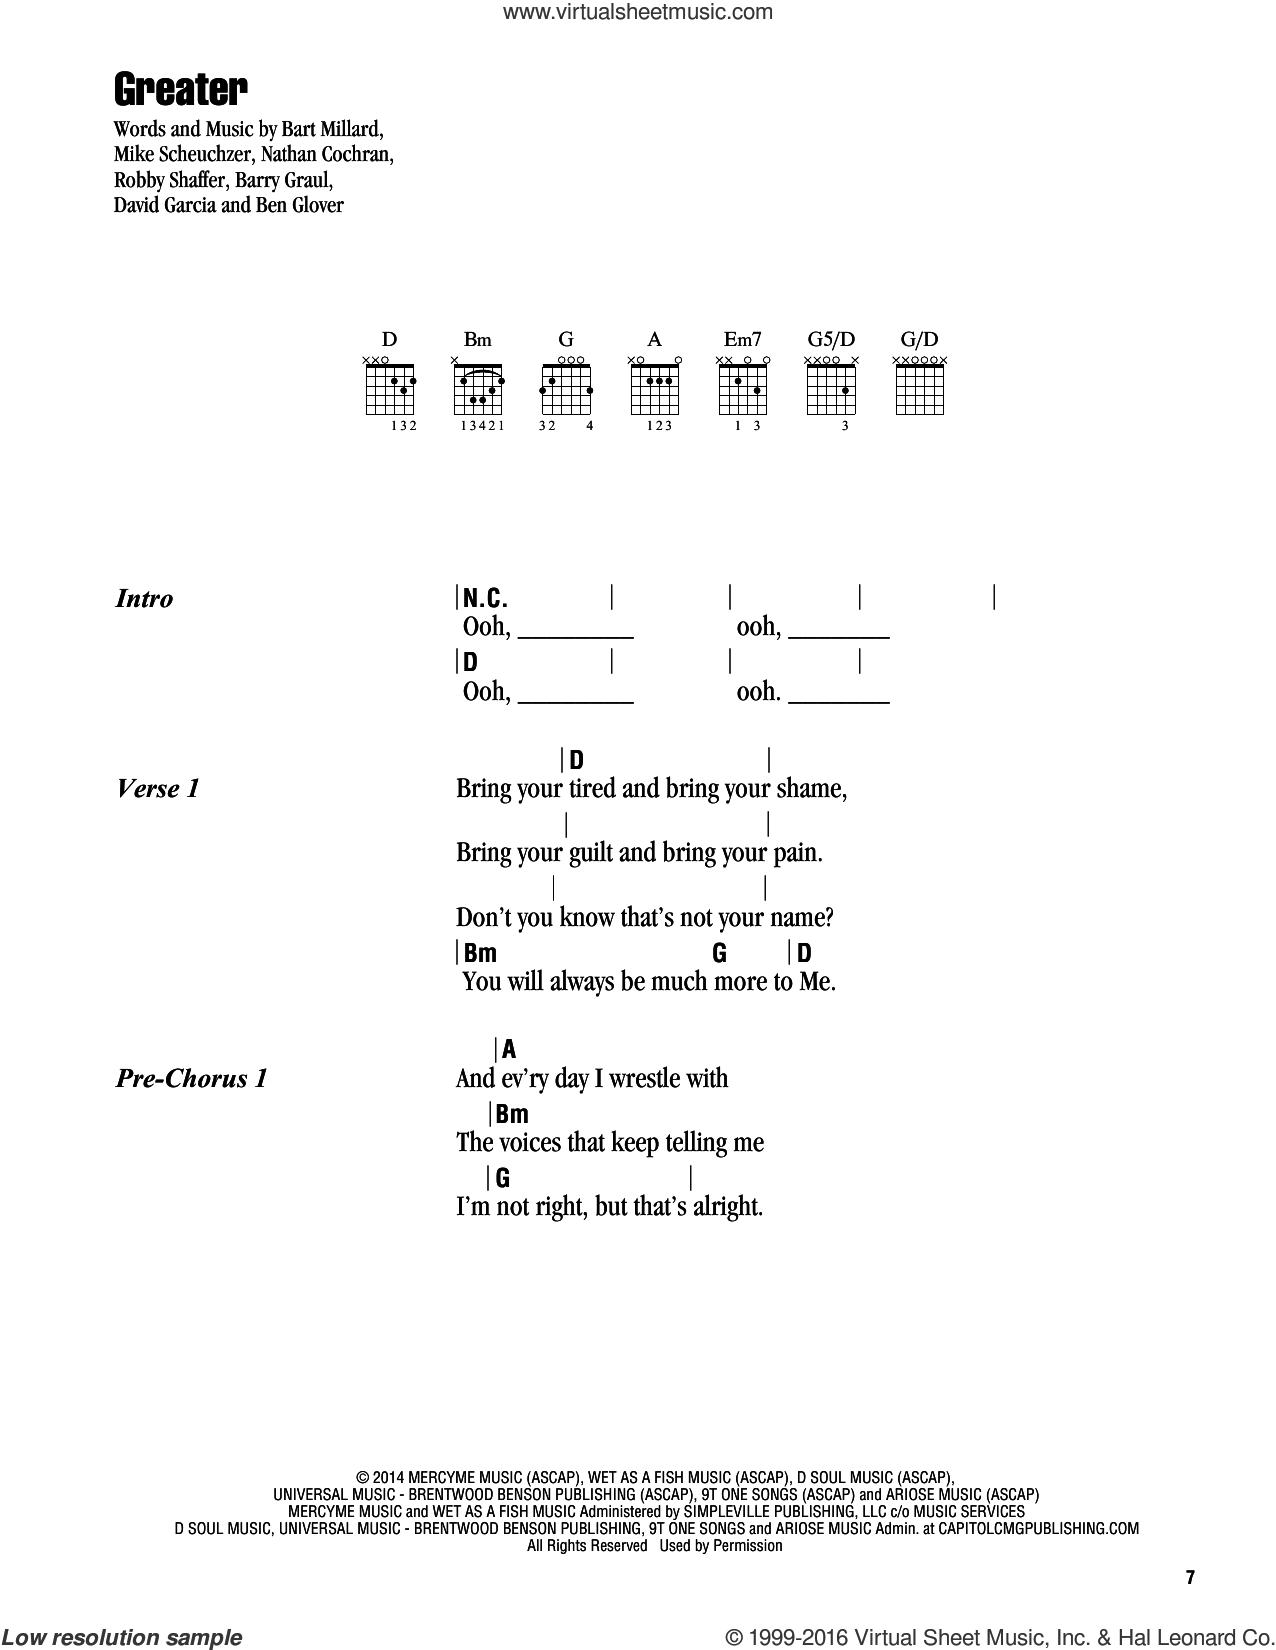 Greater sheet music for guitar (chords) by MercyMe, Barry Graul, Bart Millard, Ben Glover, David Garcia, Mike Scheuchzer, Nathan Cochran and Robby Shaffer, intermediate skill level